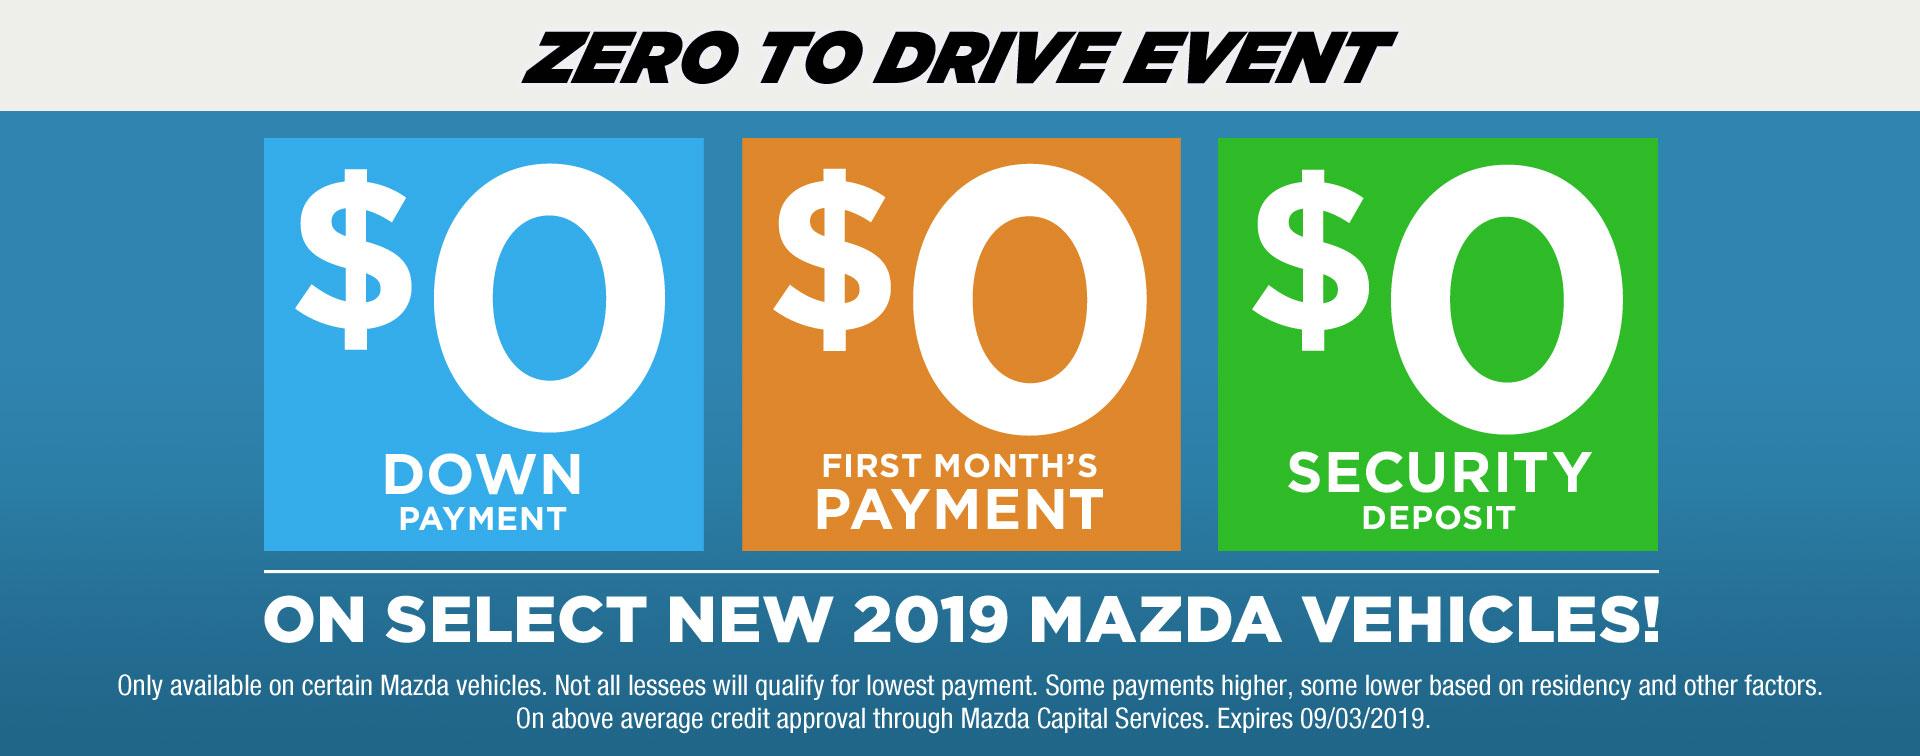 Mazda Capital Services >> Galpin Mazda Specials Incentives North Hills Near Los Angeles Ca